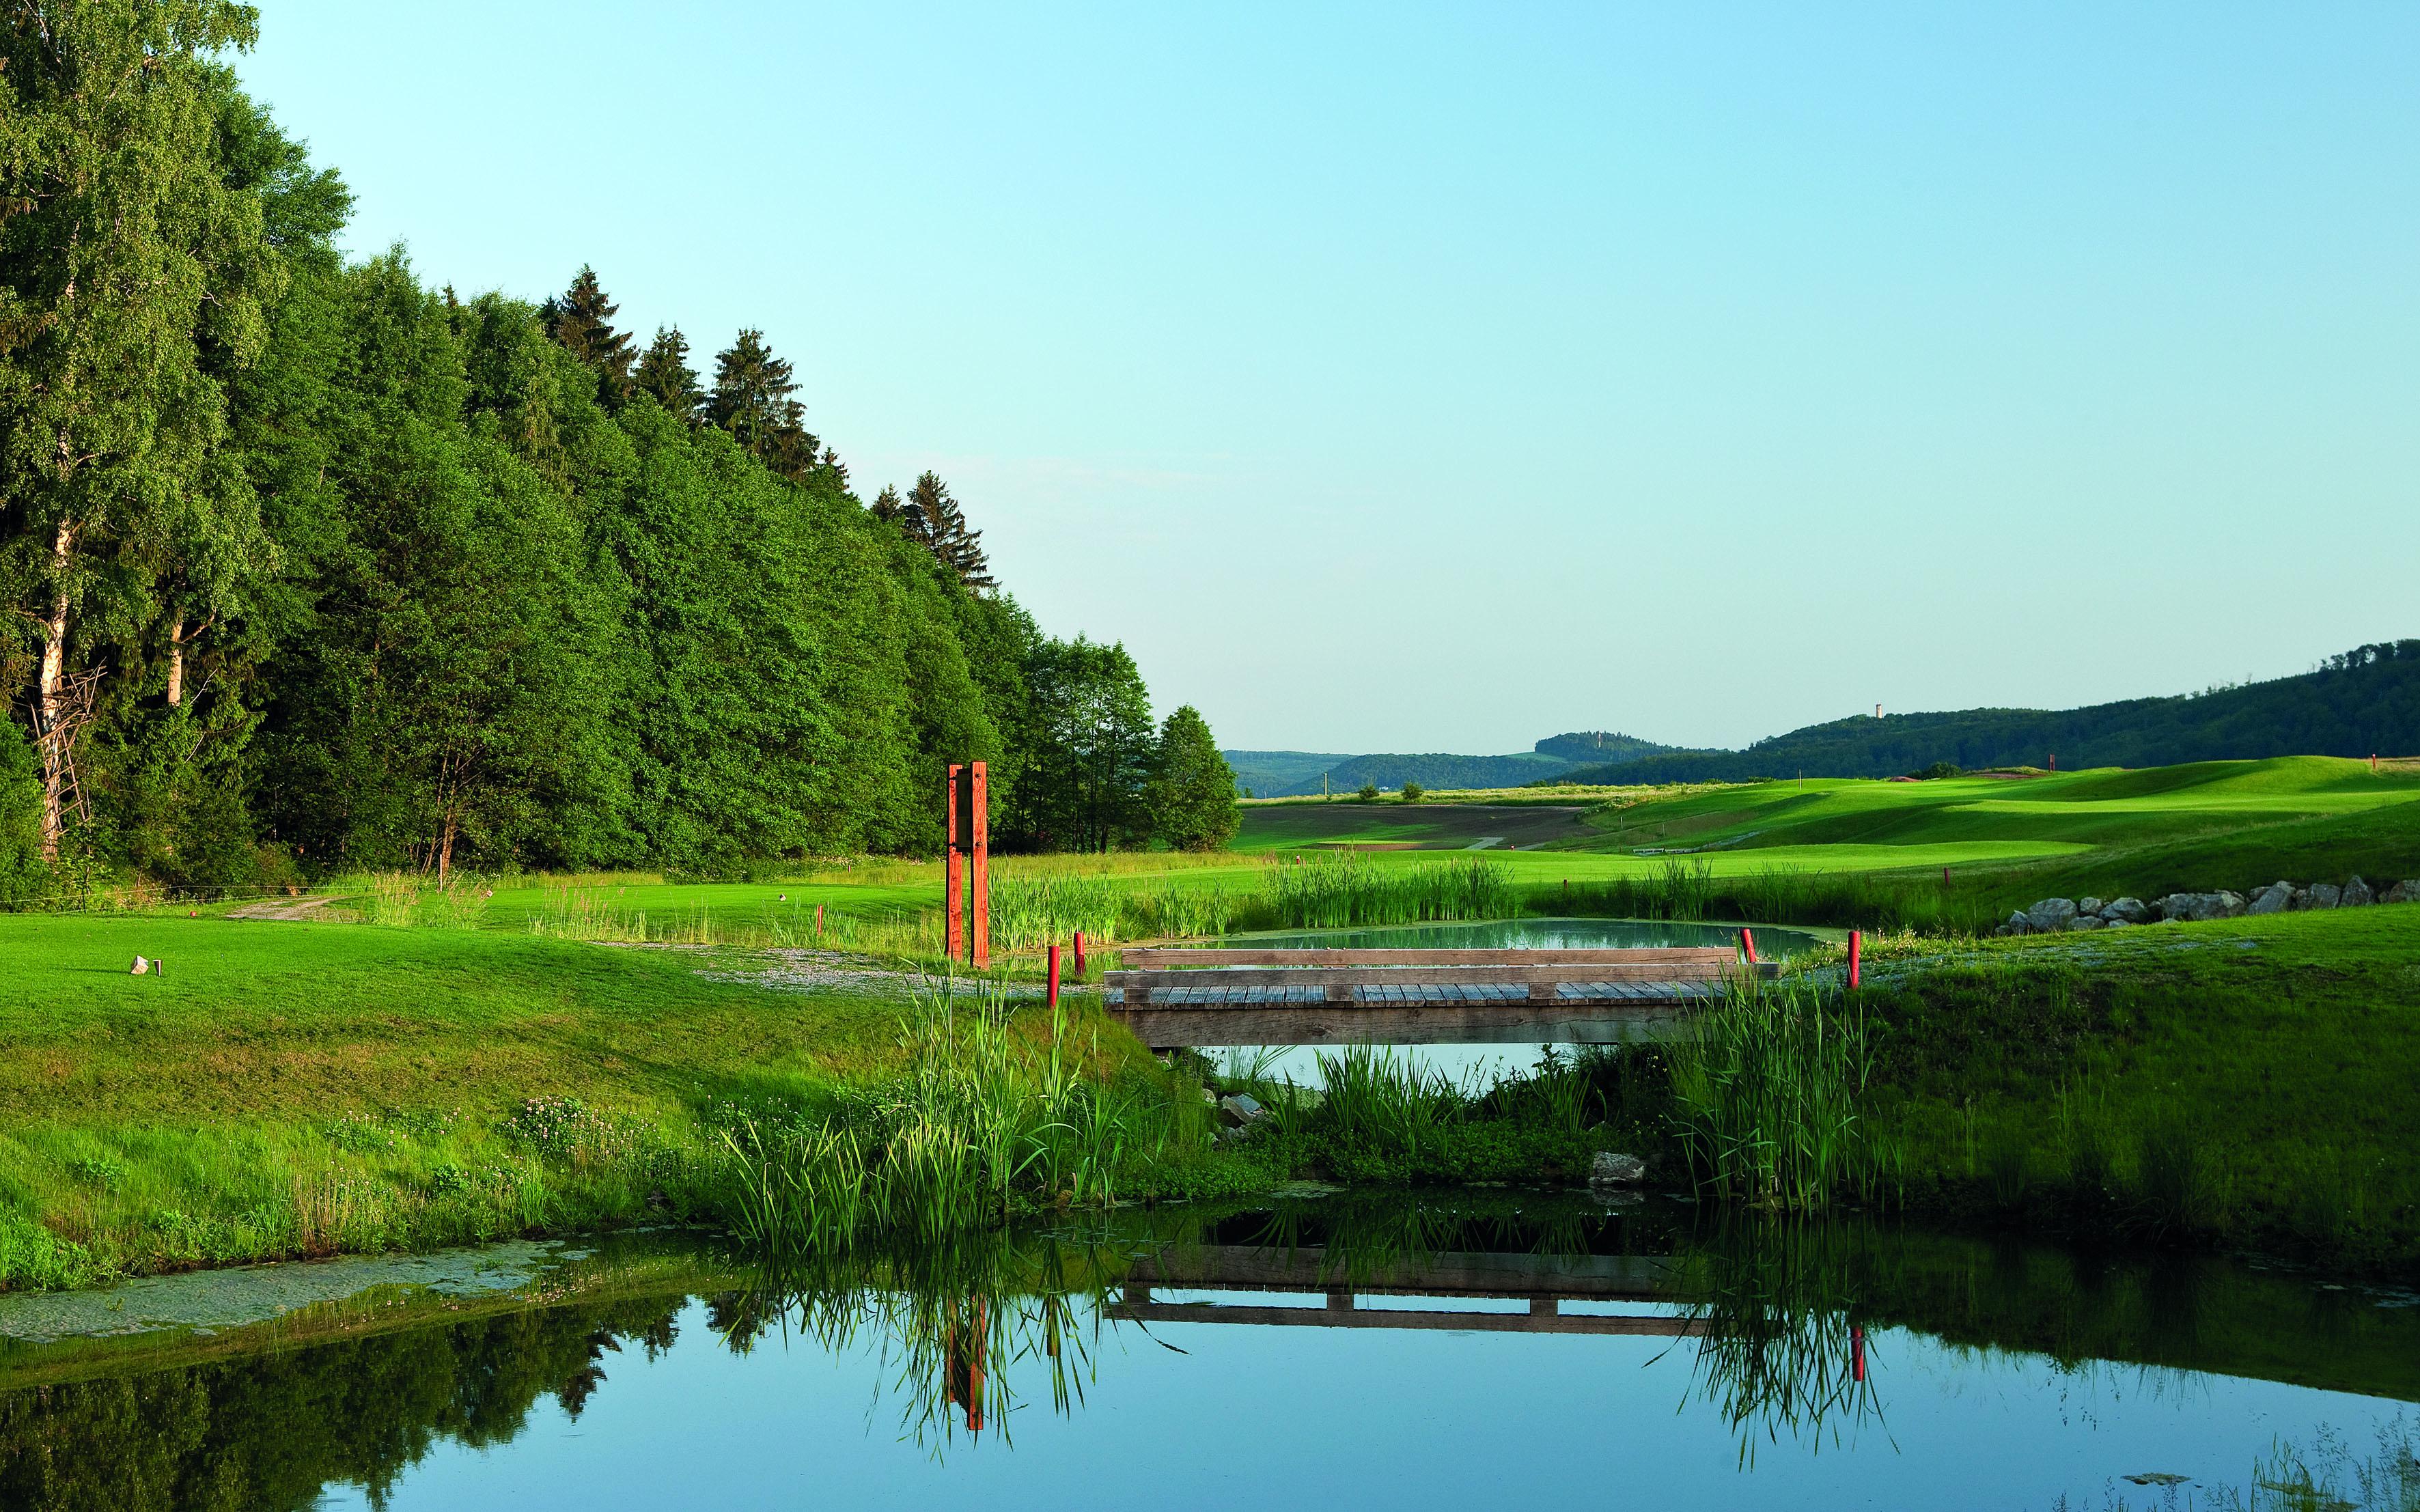 Overview of golf course named Spa & GolfResort Weimarer Land